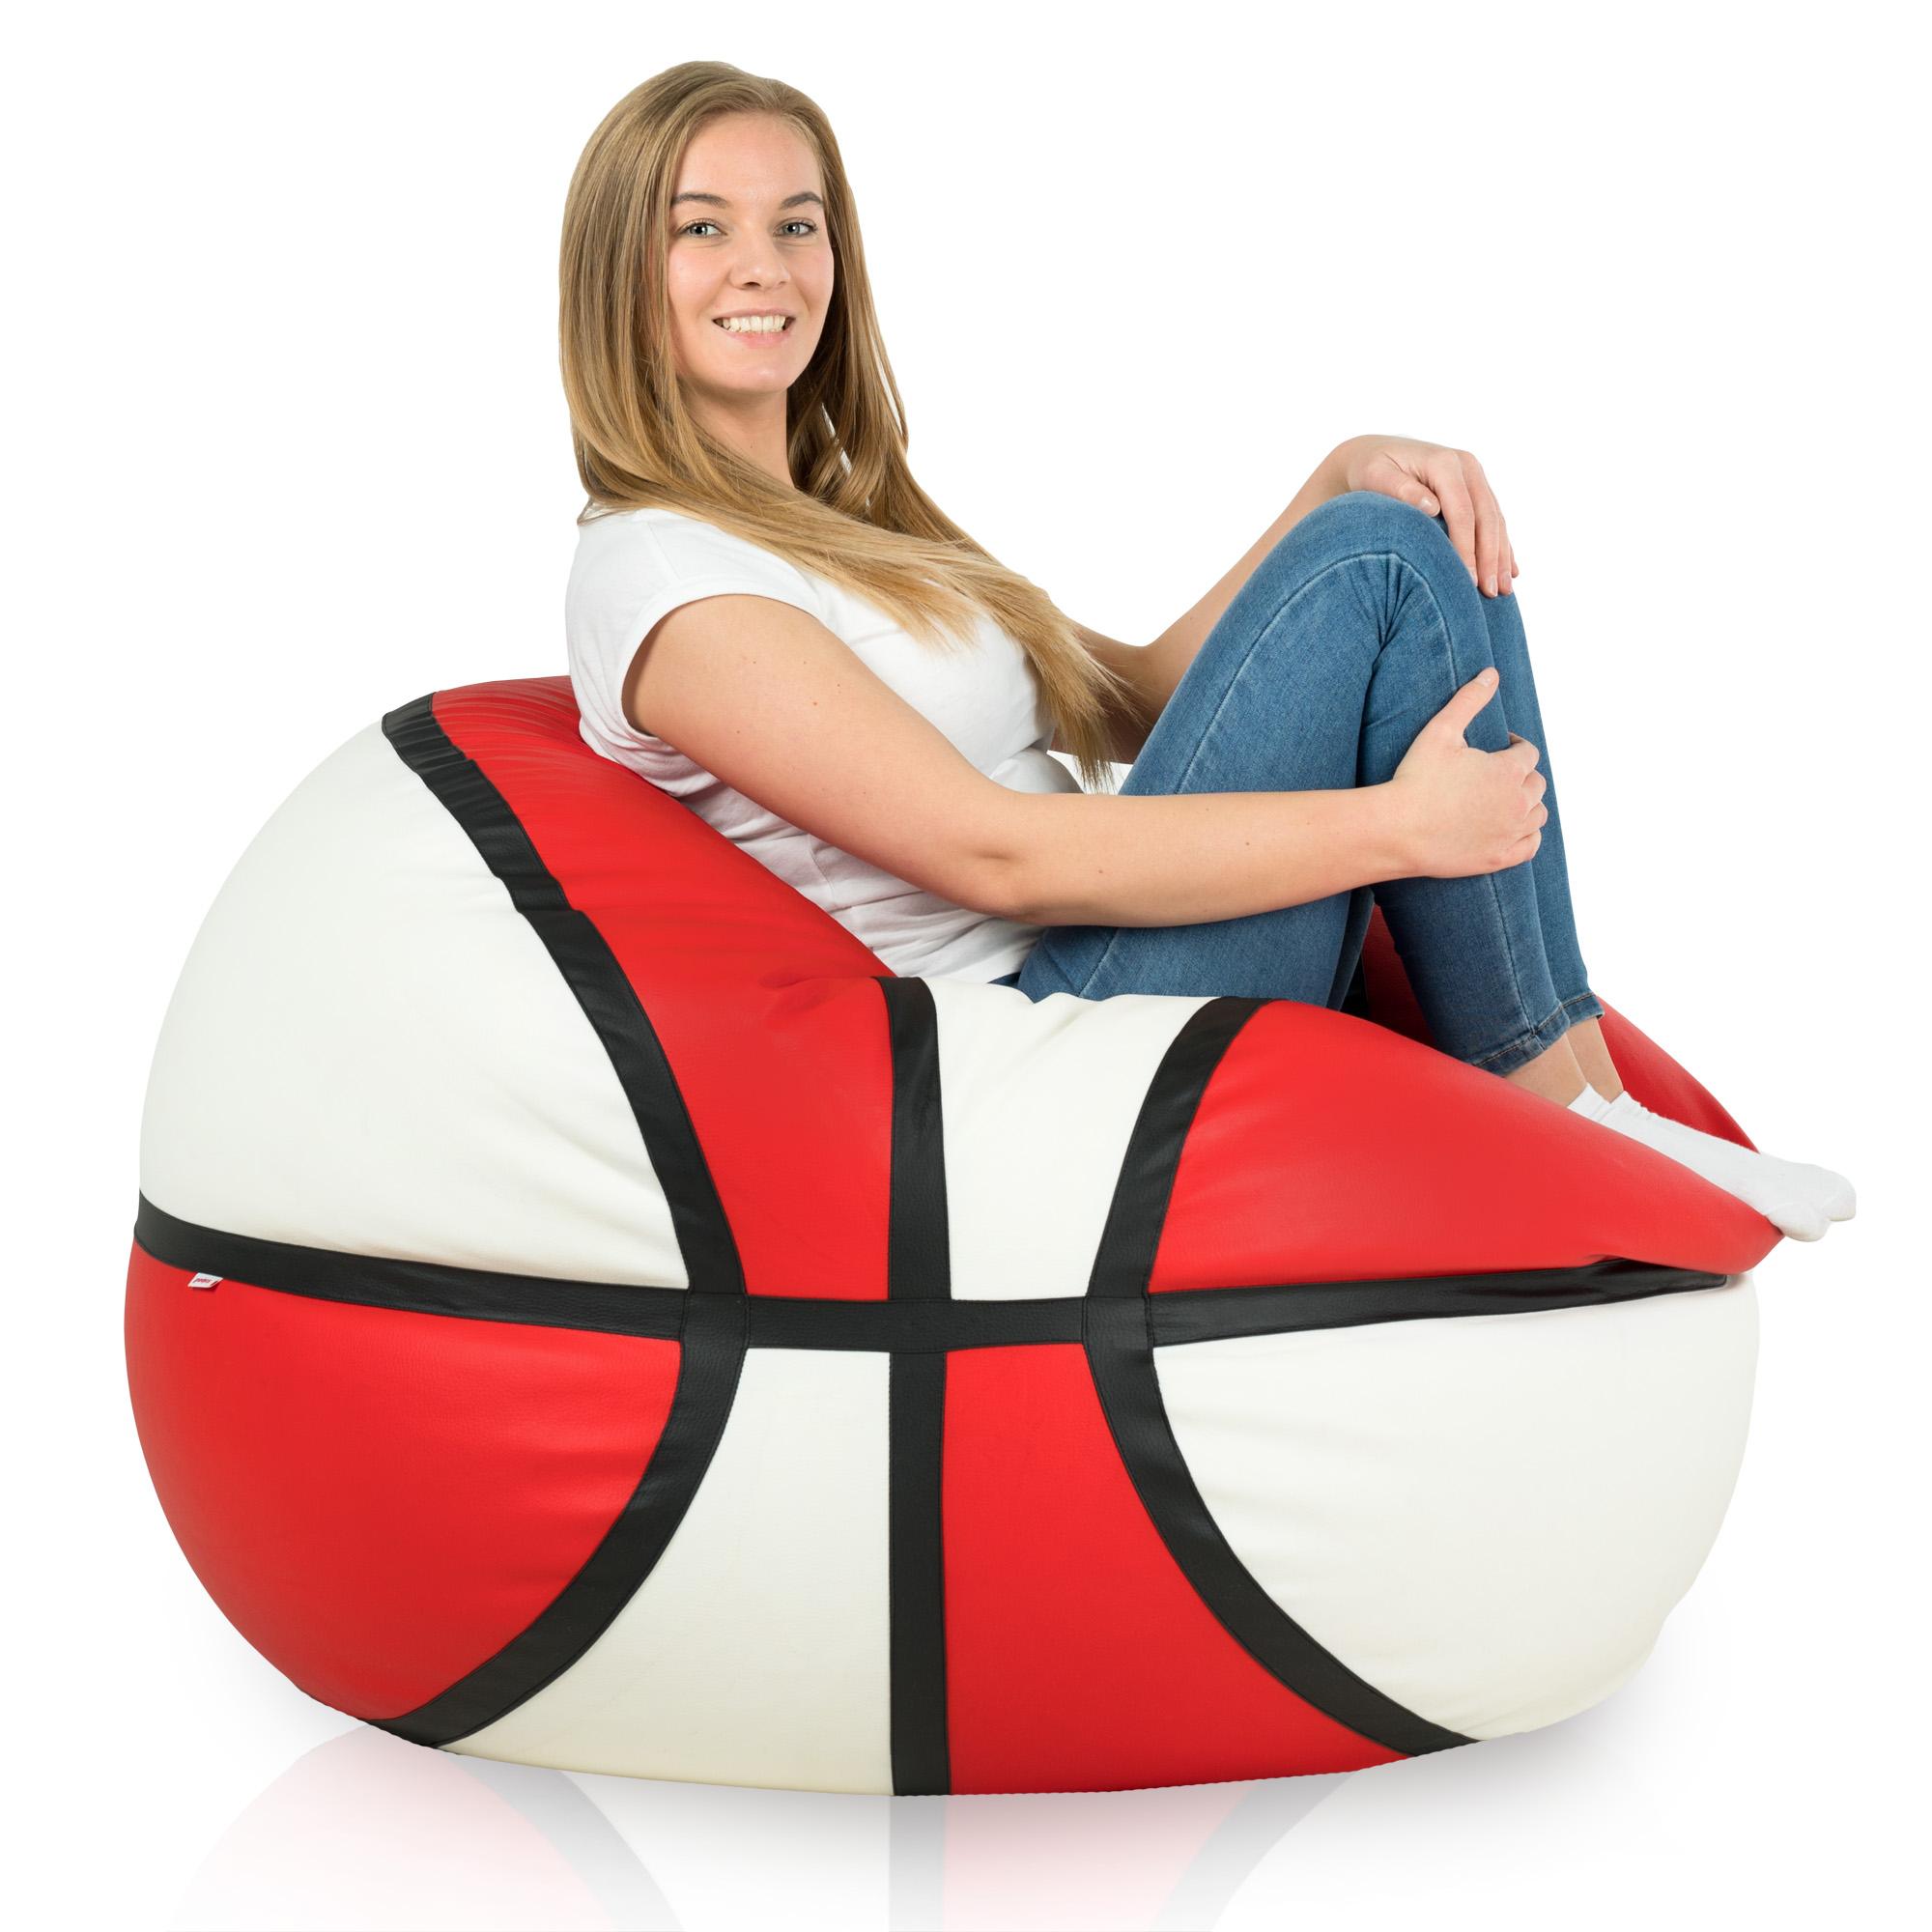 sitzsack basketball riesiger sitzsack zum sitzen oder zum. Black Bedroom Furniture Sets. Home Design Ideas